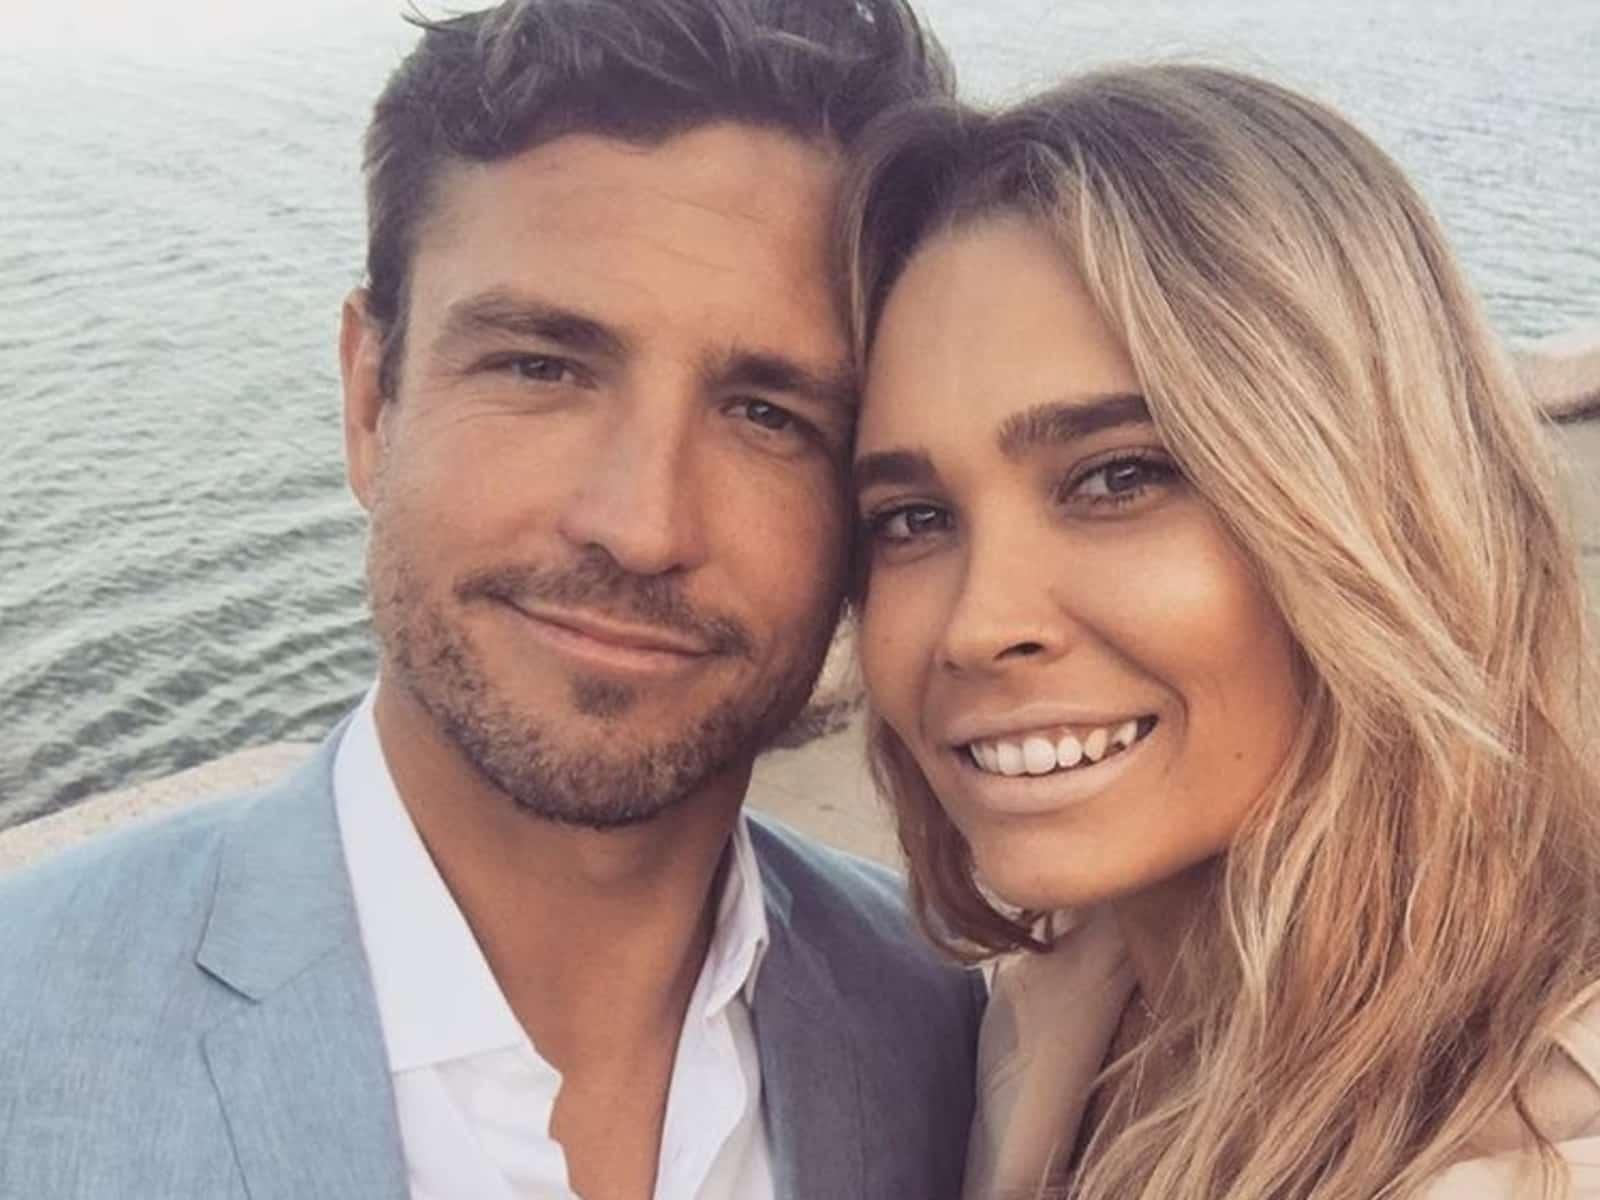 Brooke & James from Gold Coast, Queensland, Australia